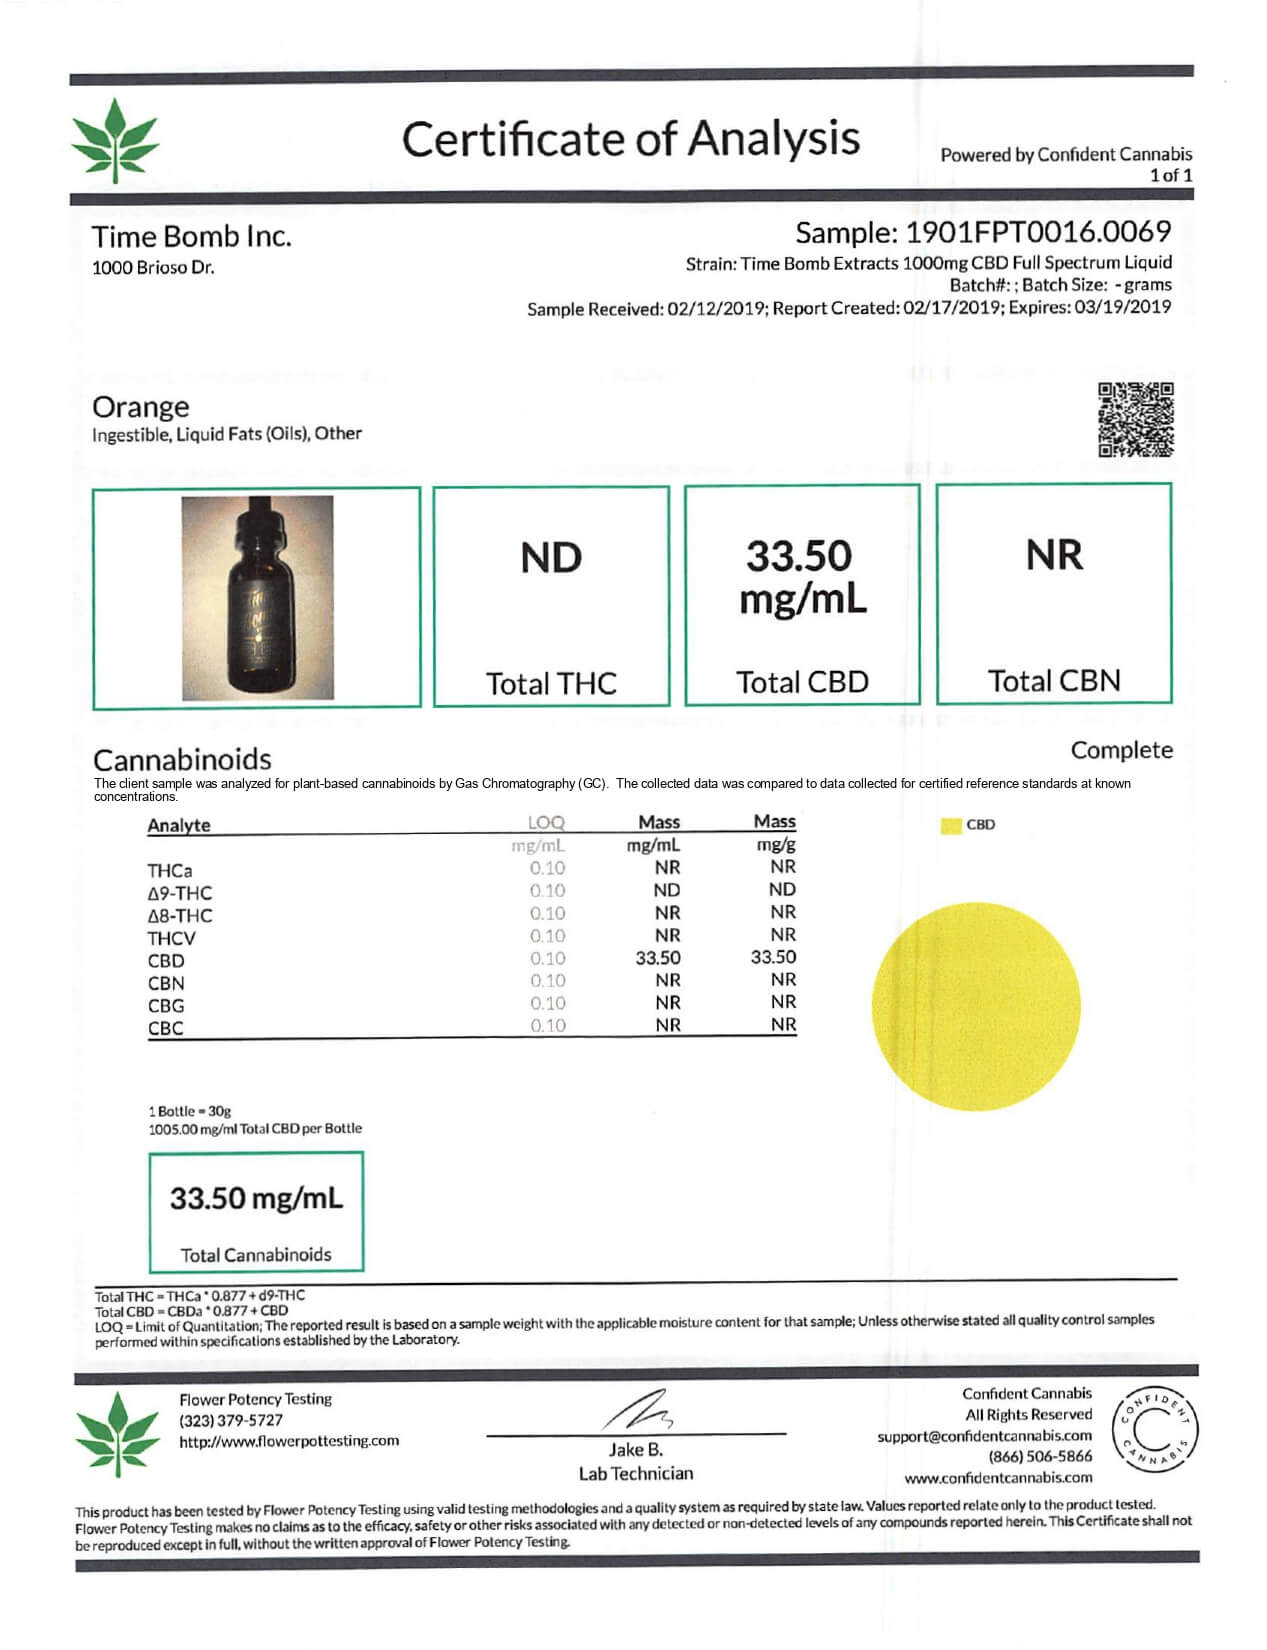 Time Bomb Extracts CBD Tincture Orange 1000mg Lab Report